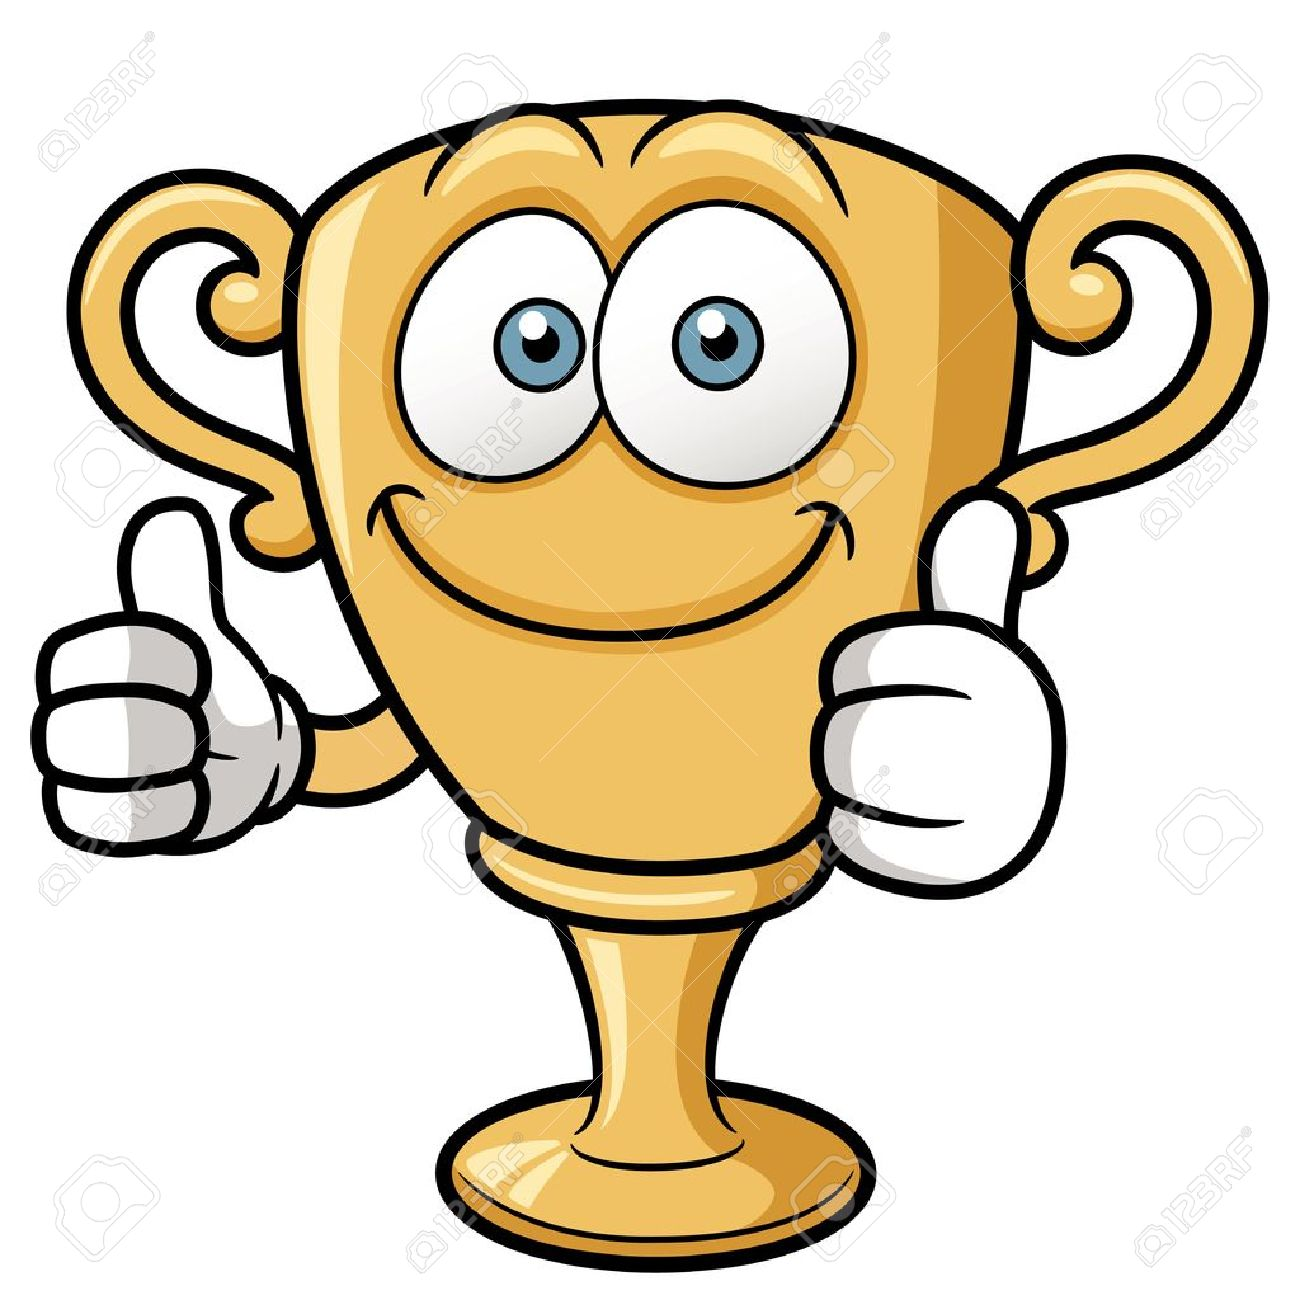 Free trophy download best. Win clipart cute